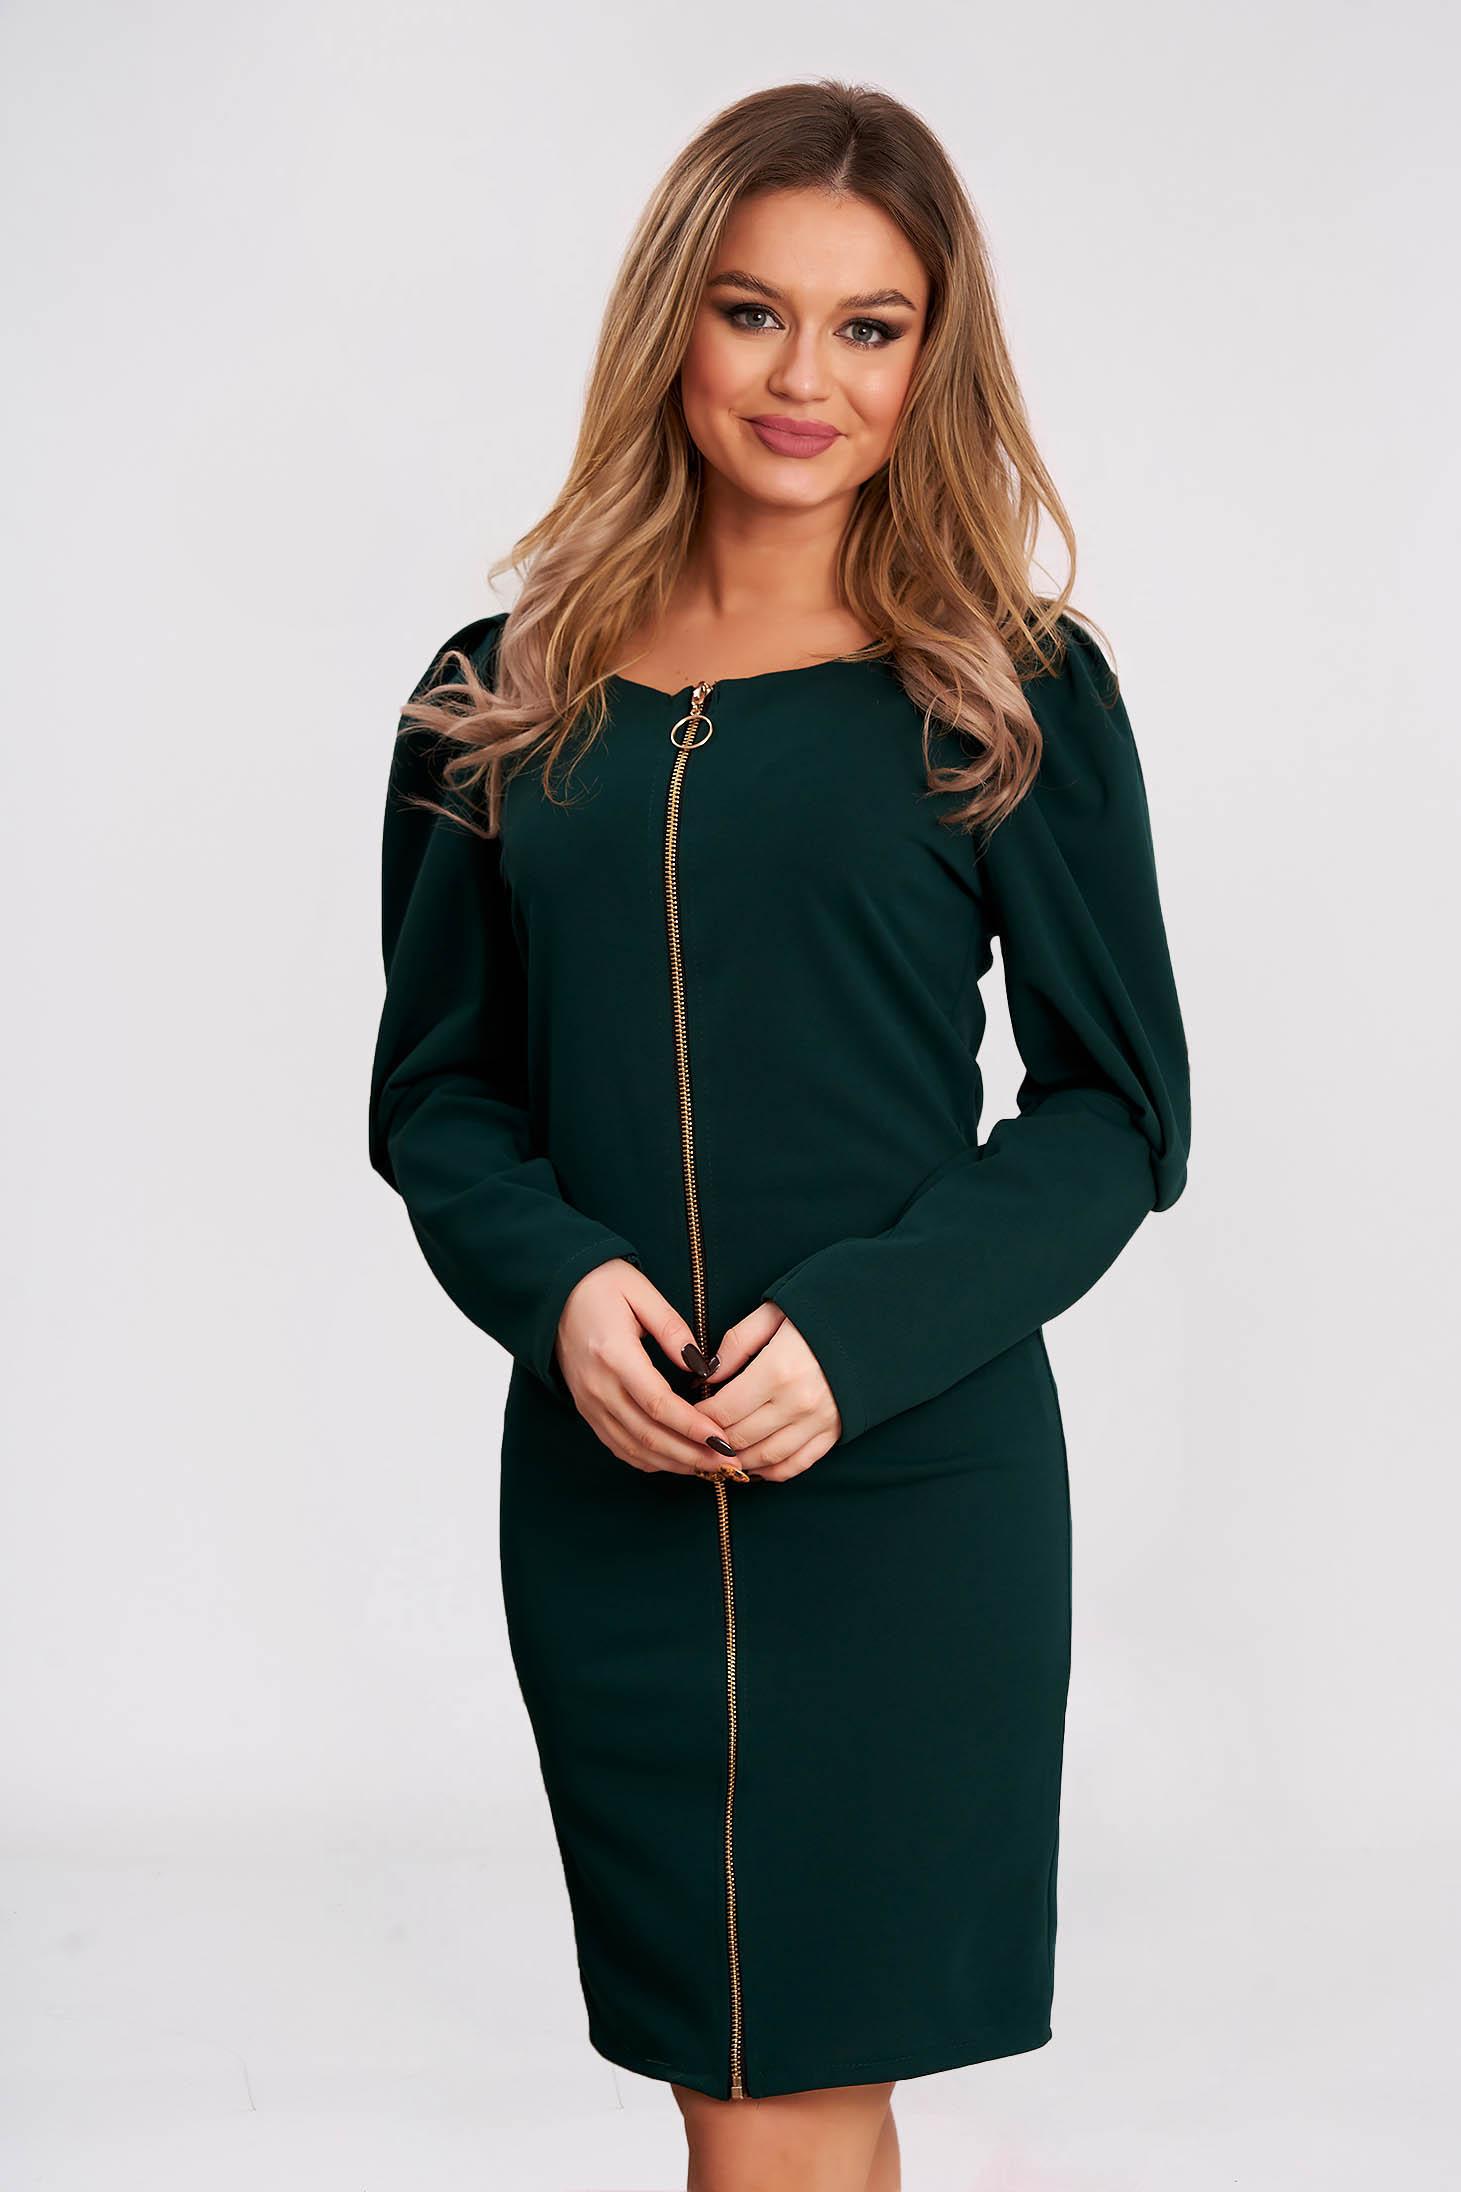 Dress slightly elastic fabric darkgreen short cut flared high shoulders